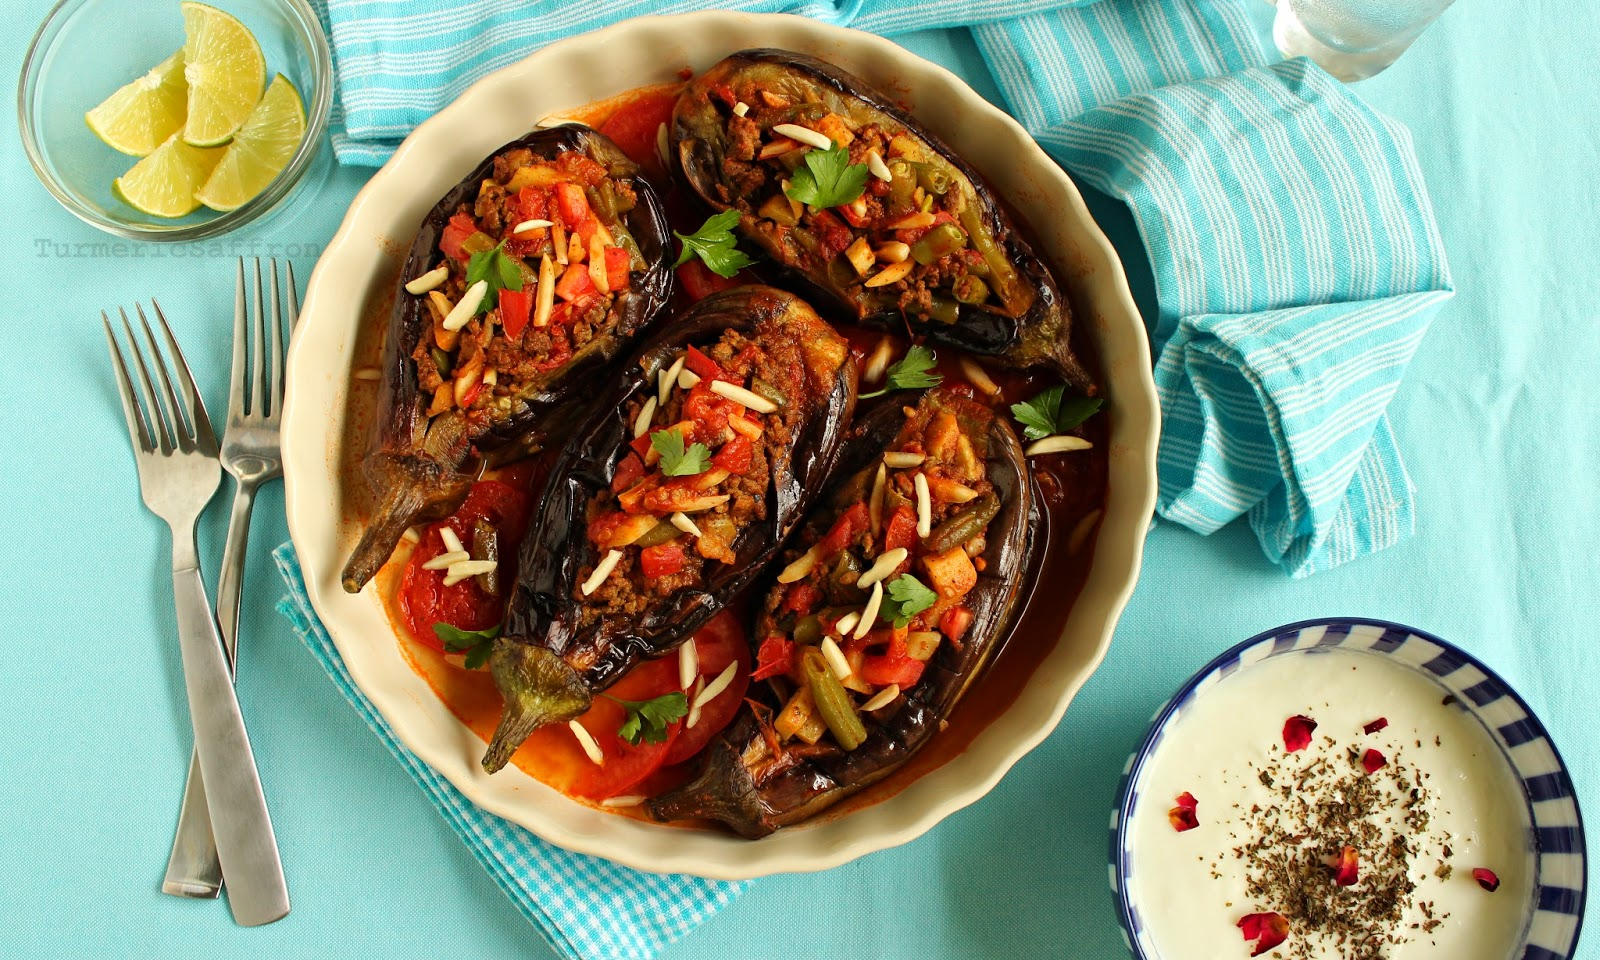 Bademjan Shekam Por Persian Stuffed Eggplant